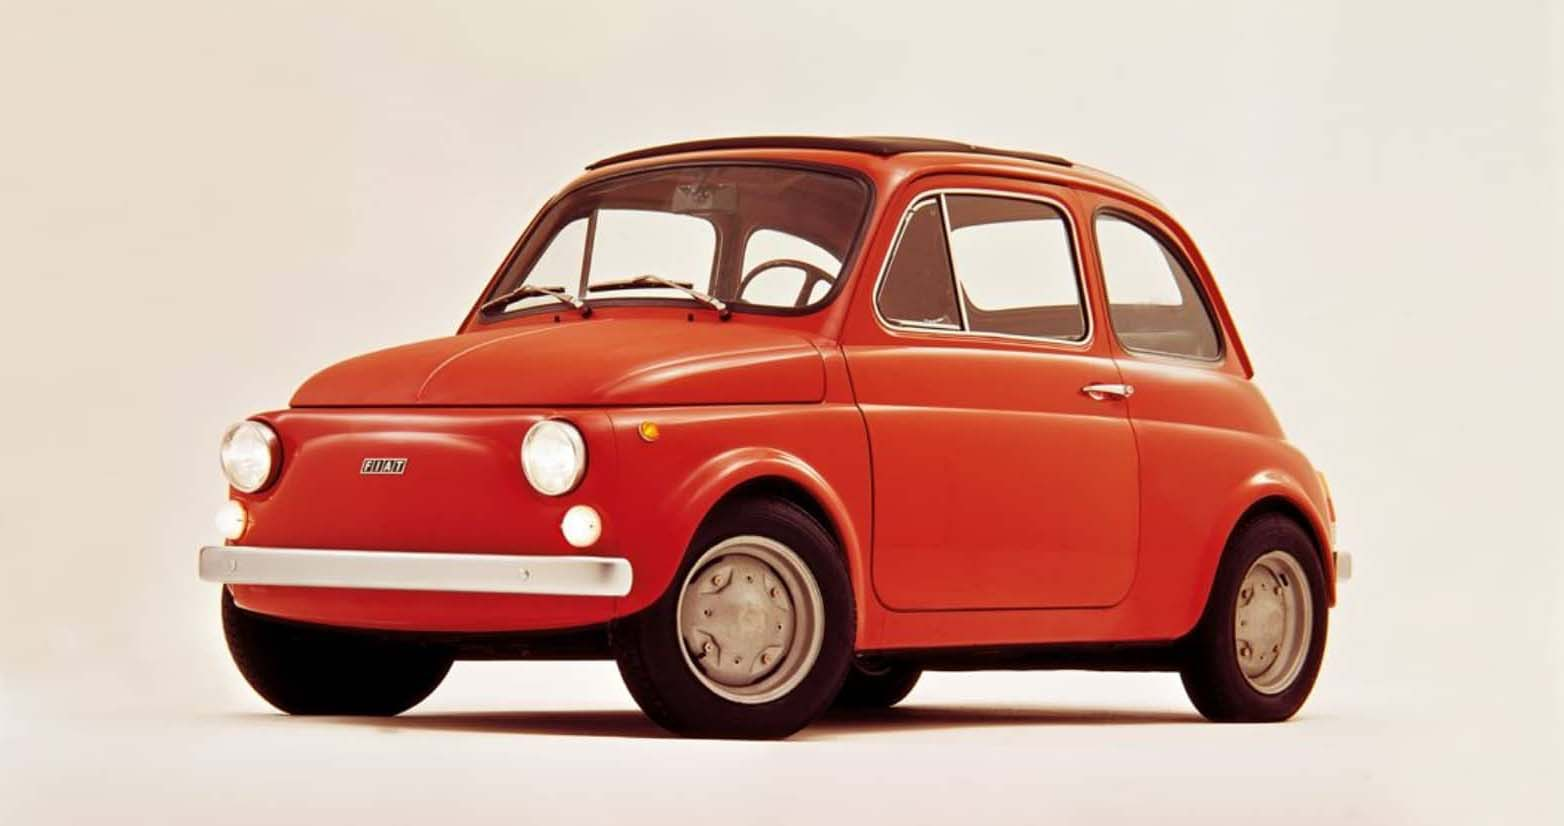 Fiat 500 rouge remise à neuf